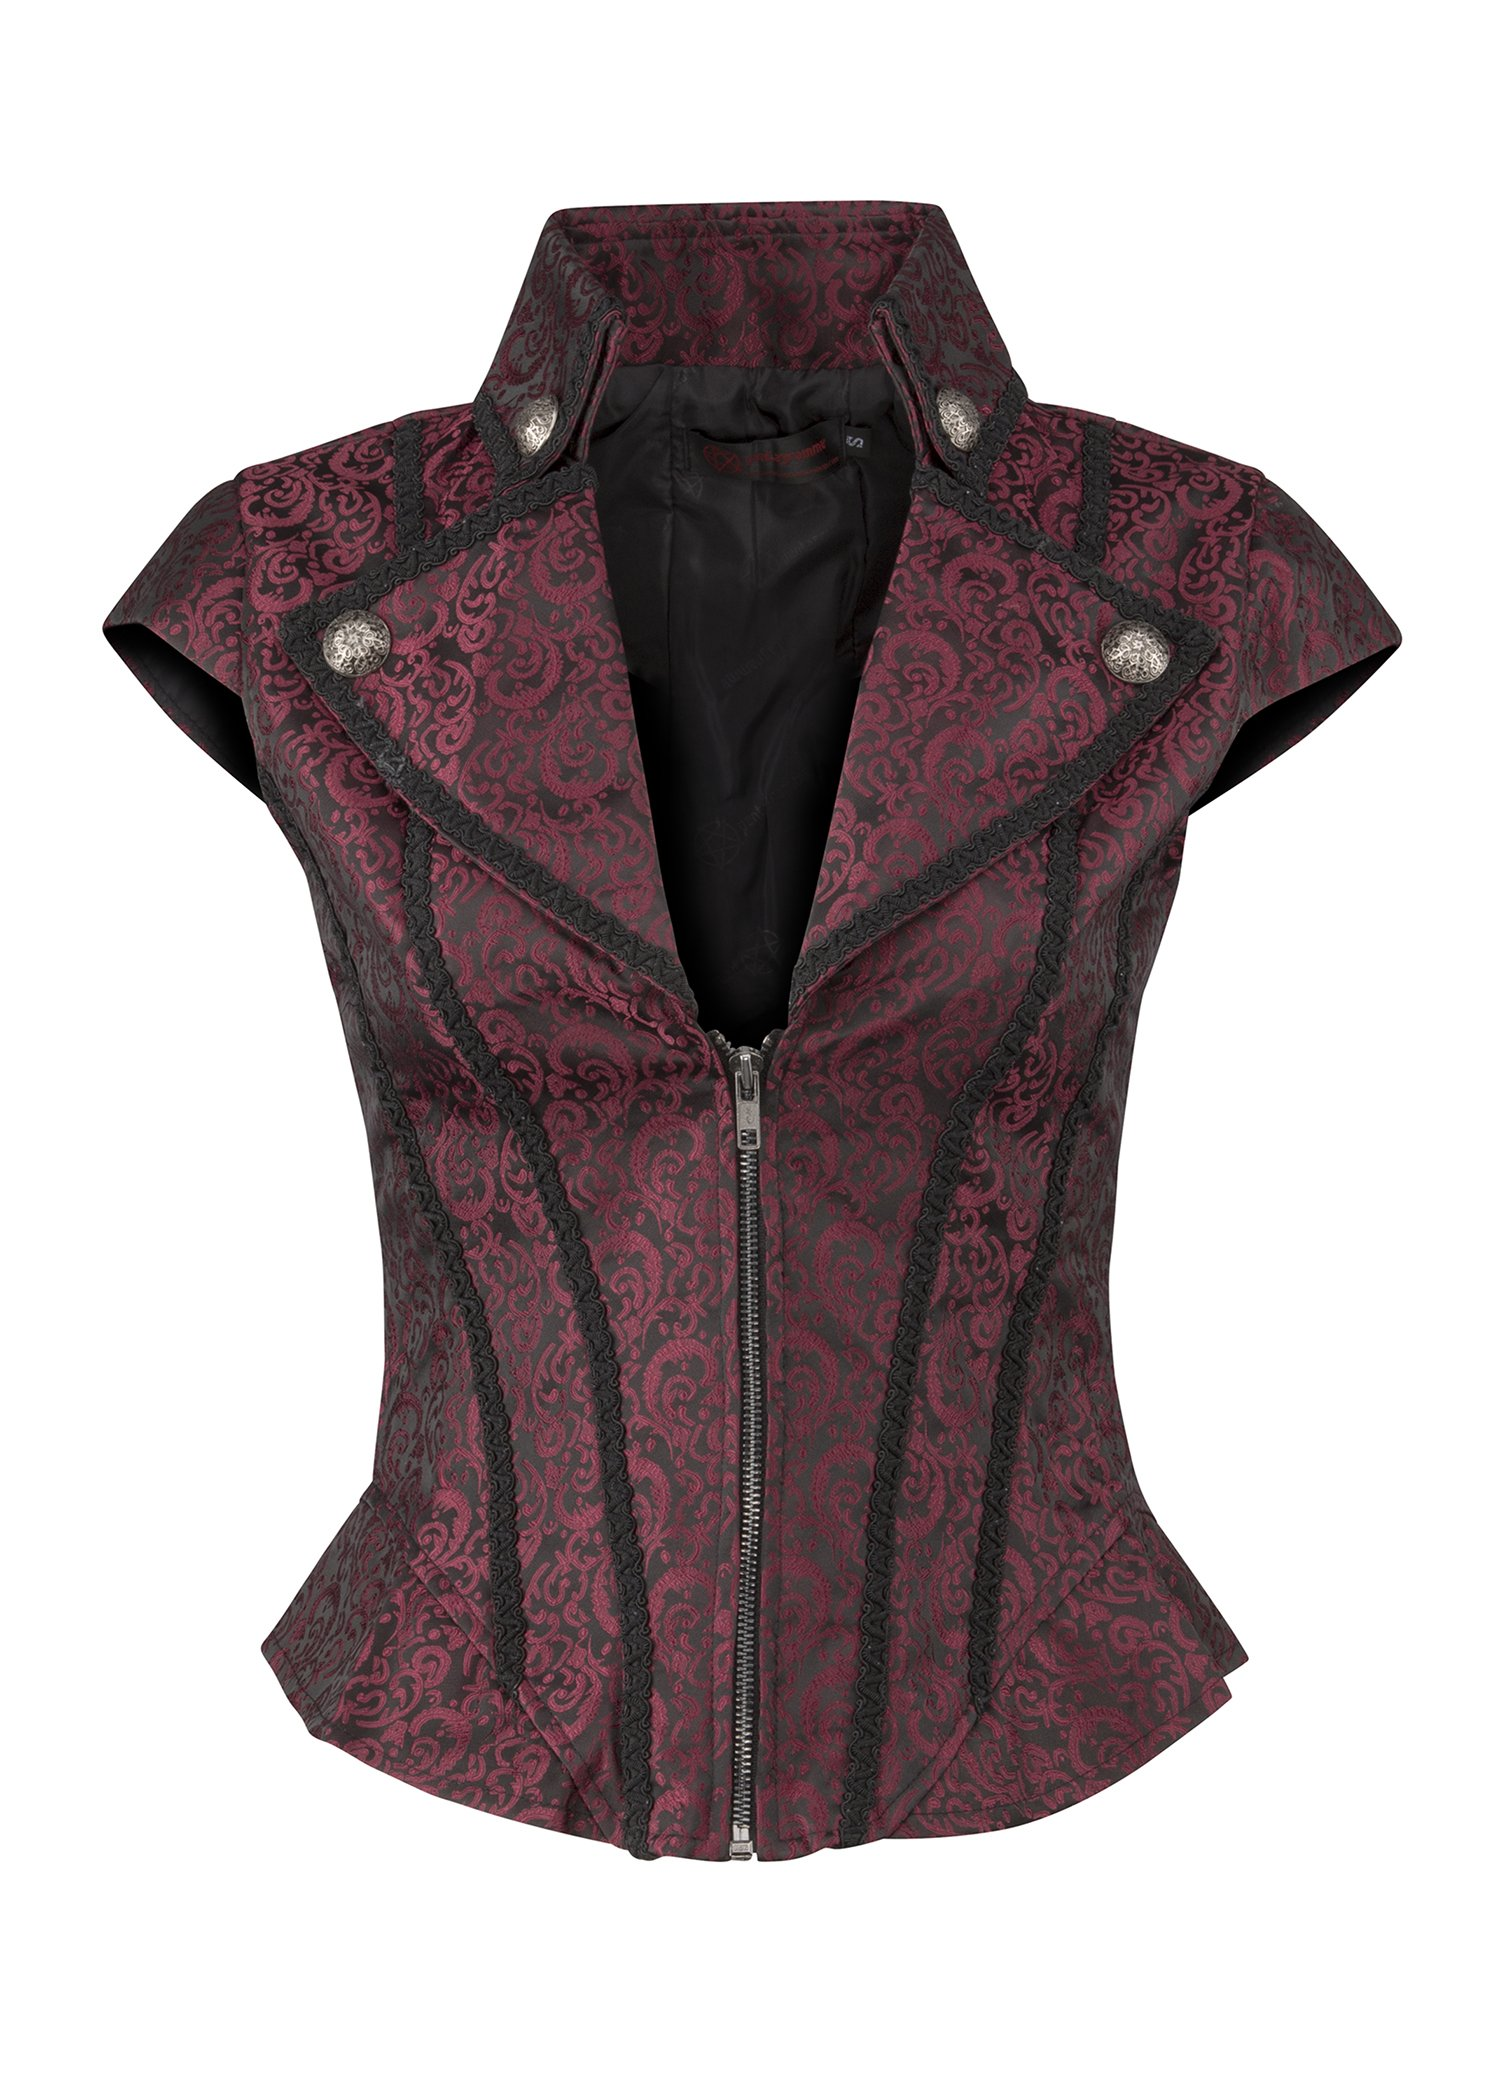 Pretty Attitude Womens Black and Red Brocade Goth Steampunk Vest Short Sleeve Jacket 3